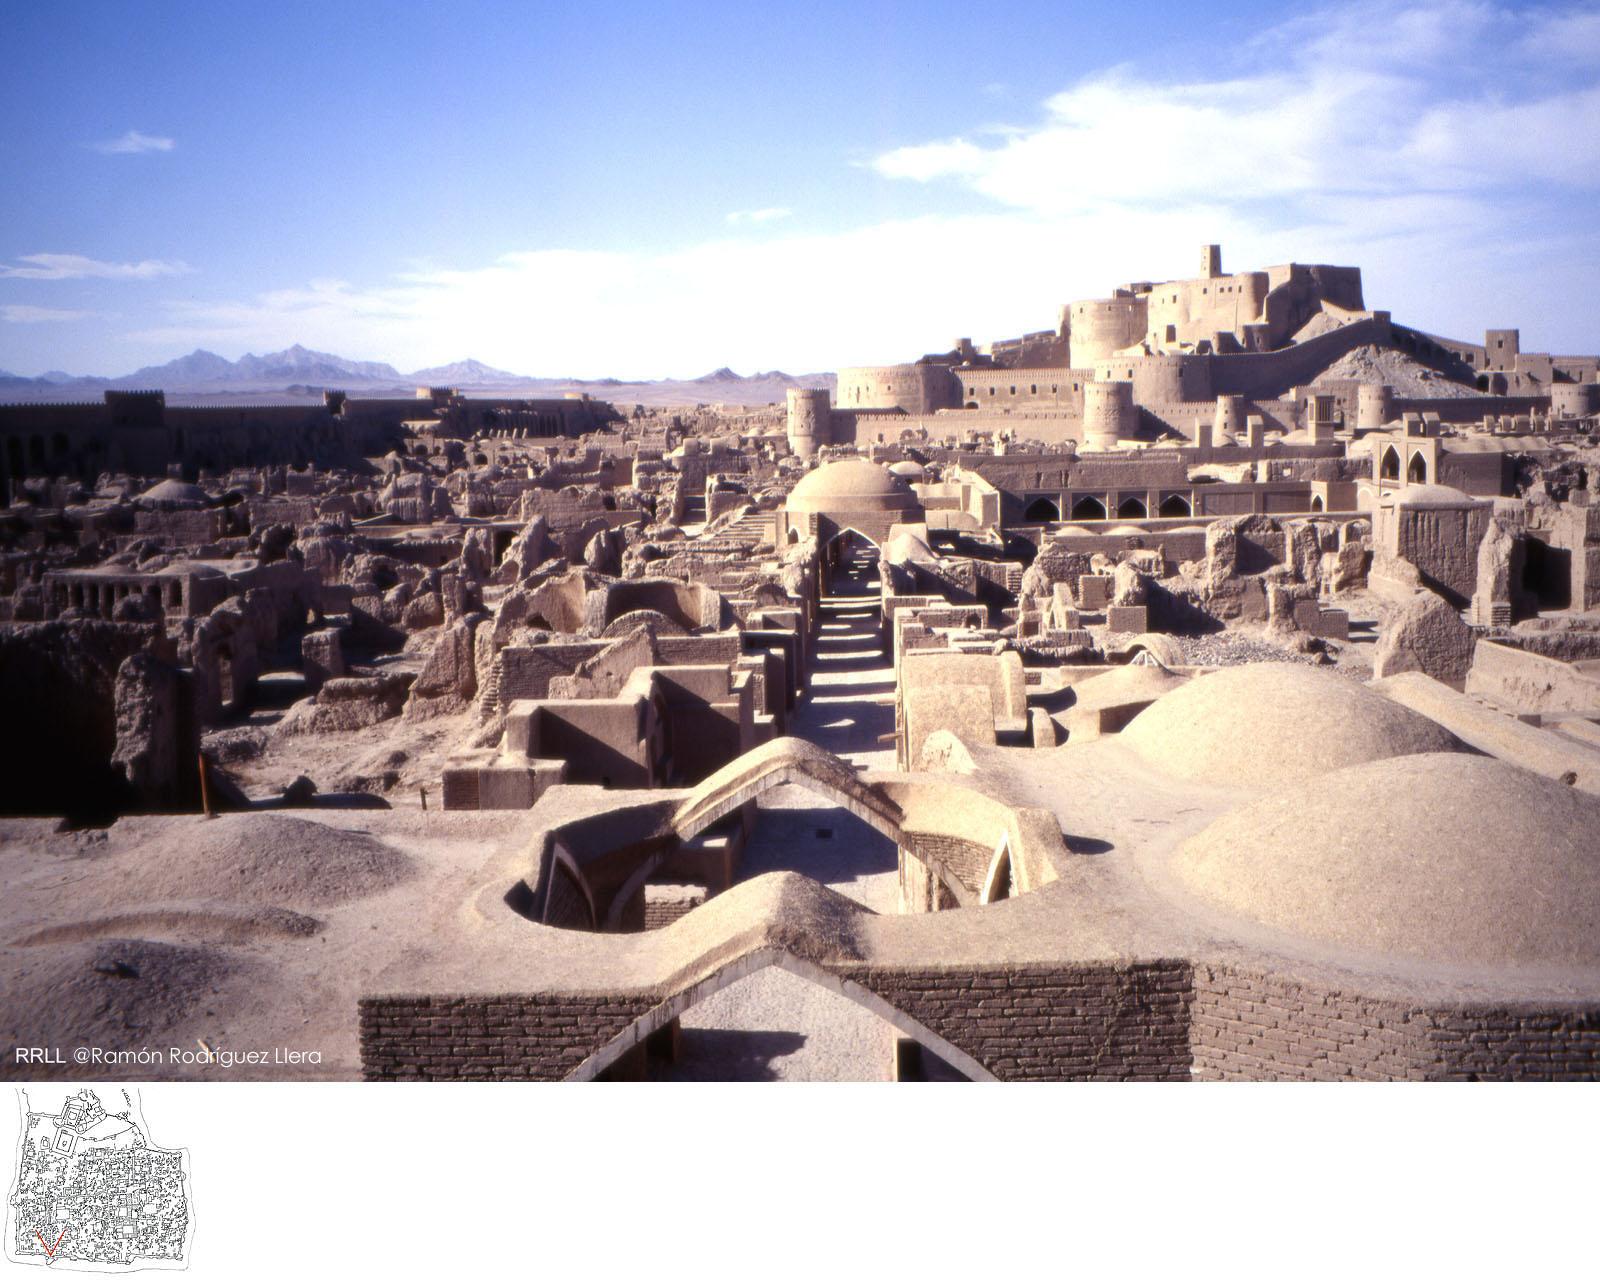 danielvillalobos-architecturalexhibition-bam-architectureofmud-16